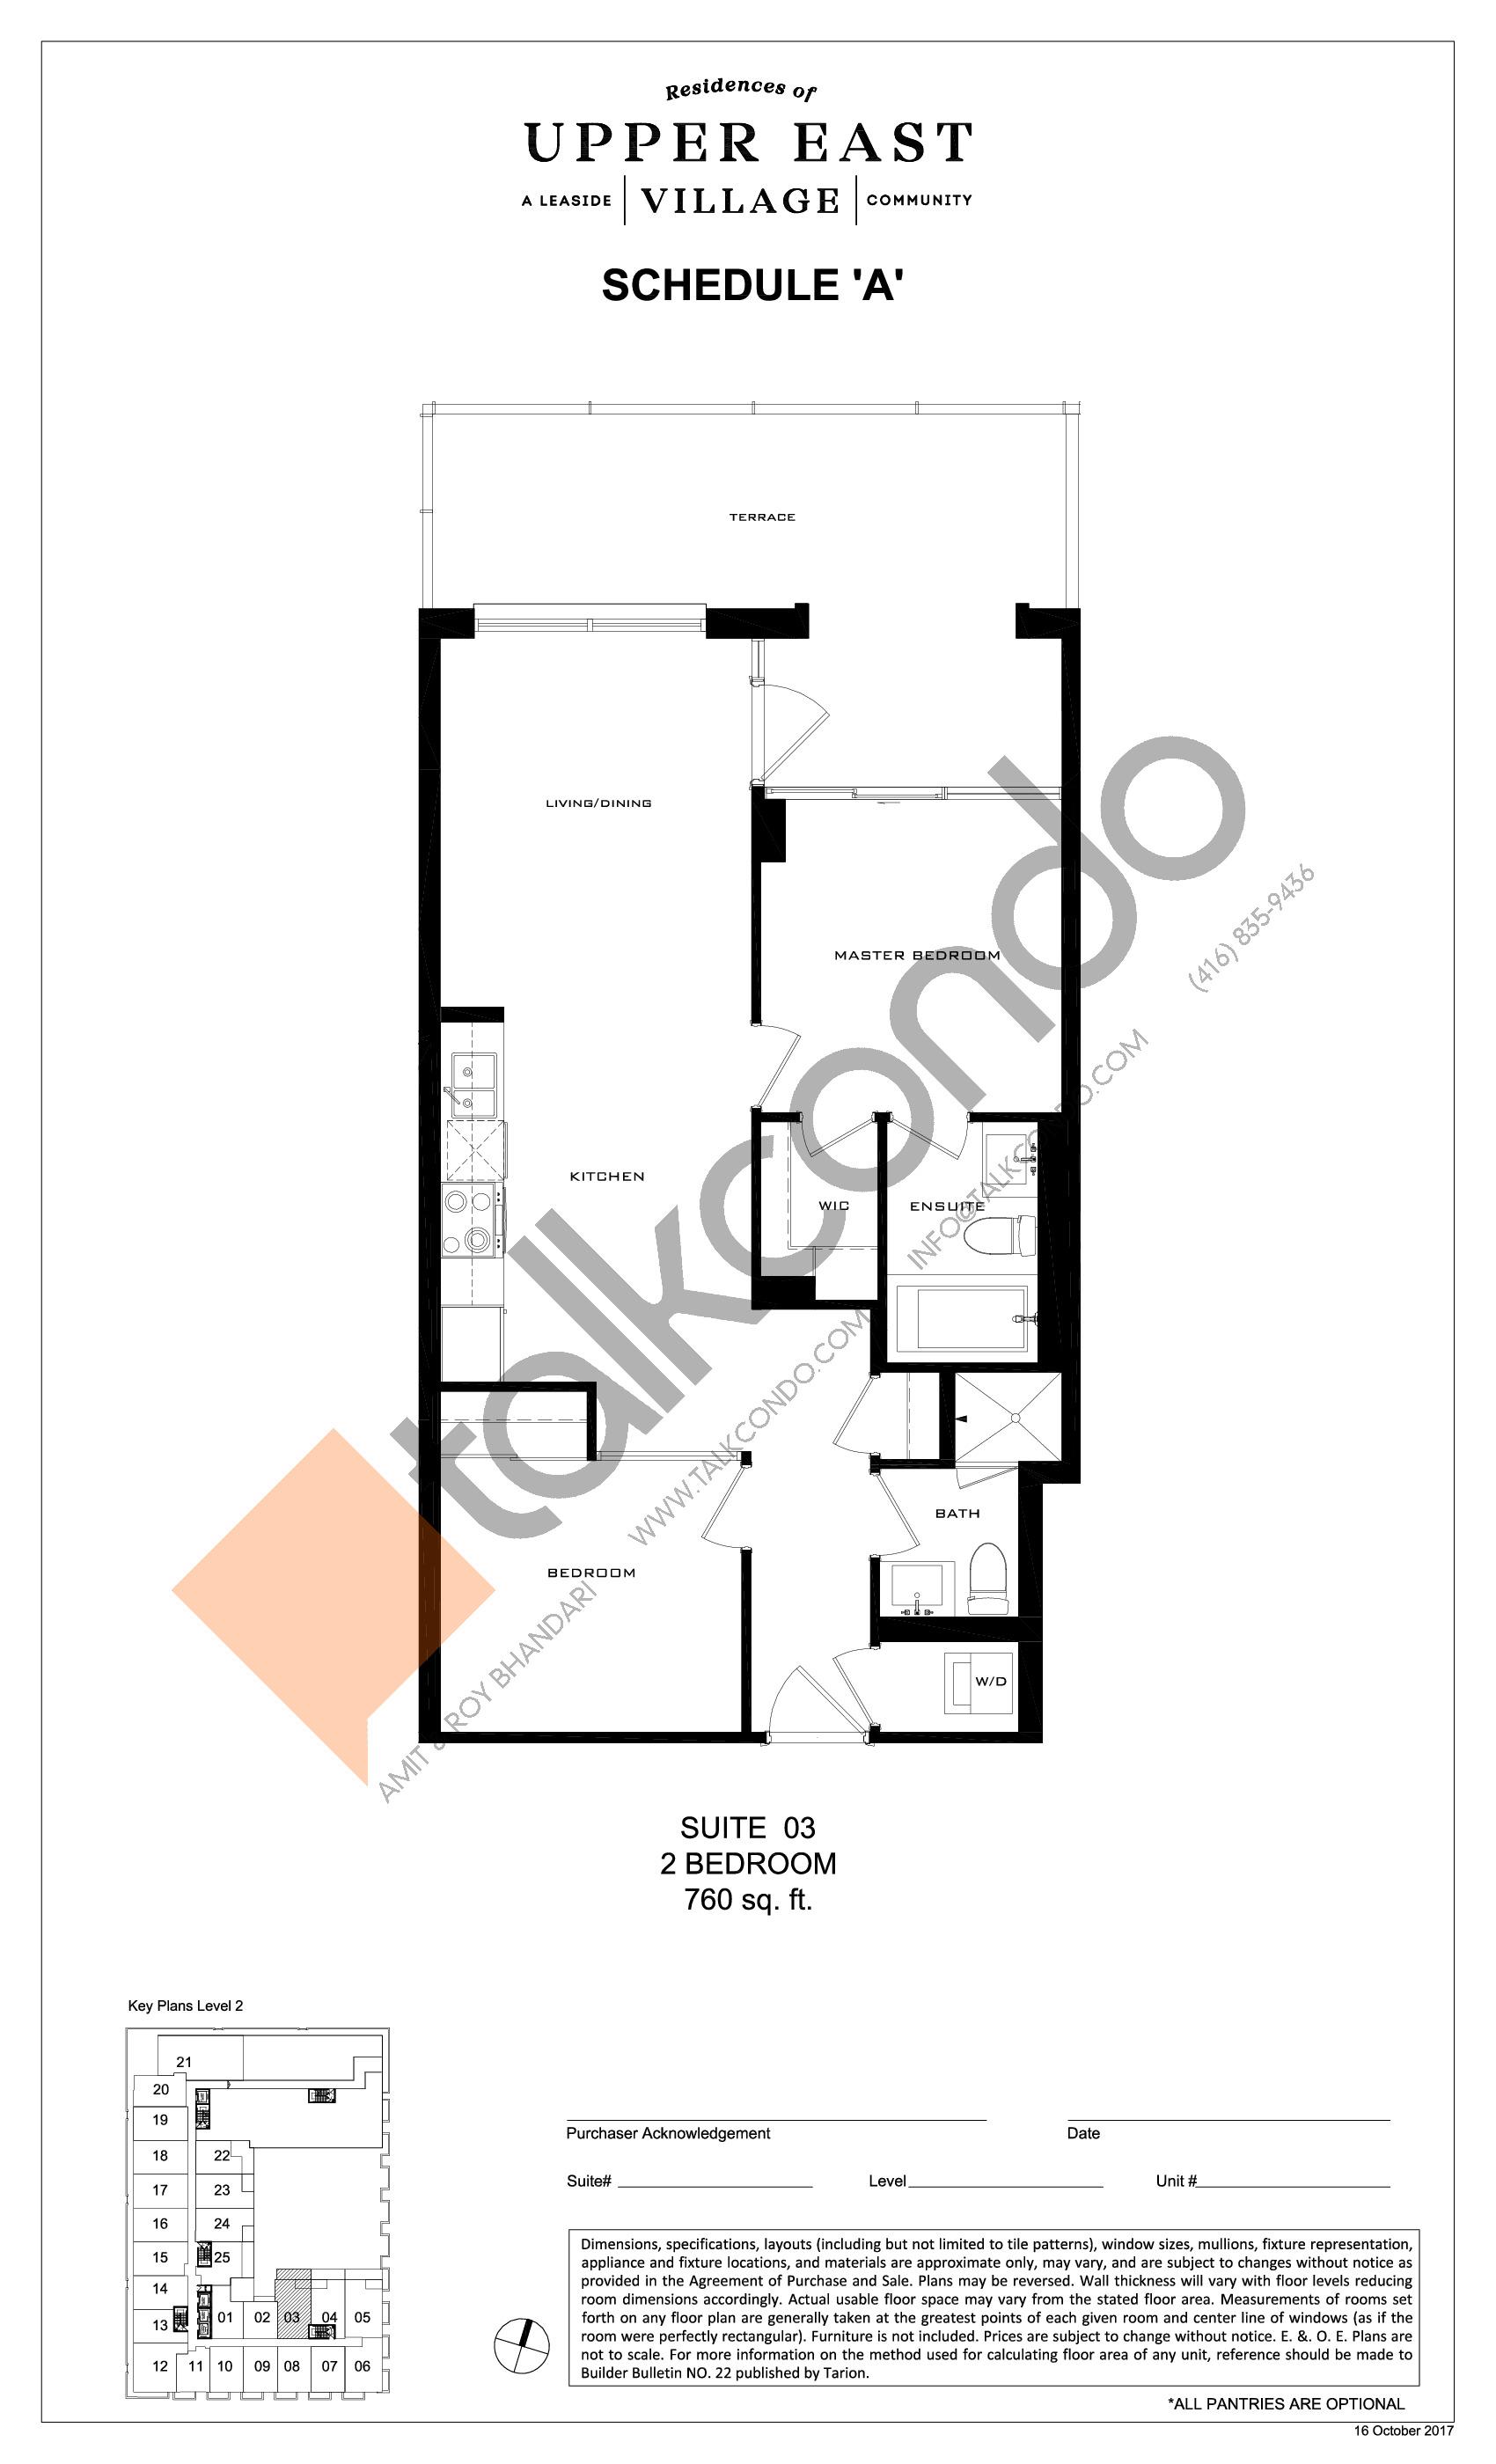 Suite 03 Floor Plan at Upper East Village Condos - 760 sq.ft